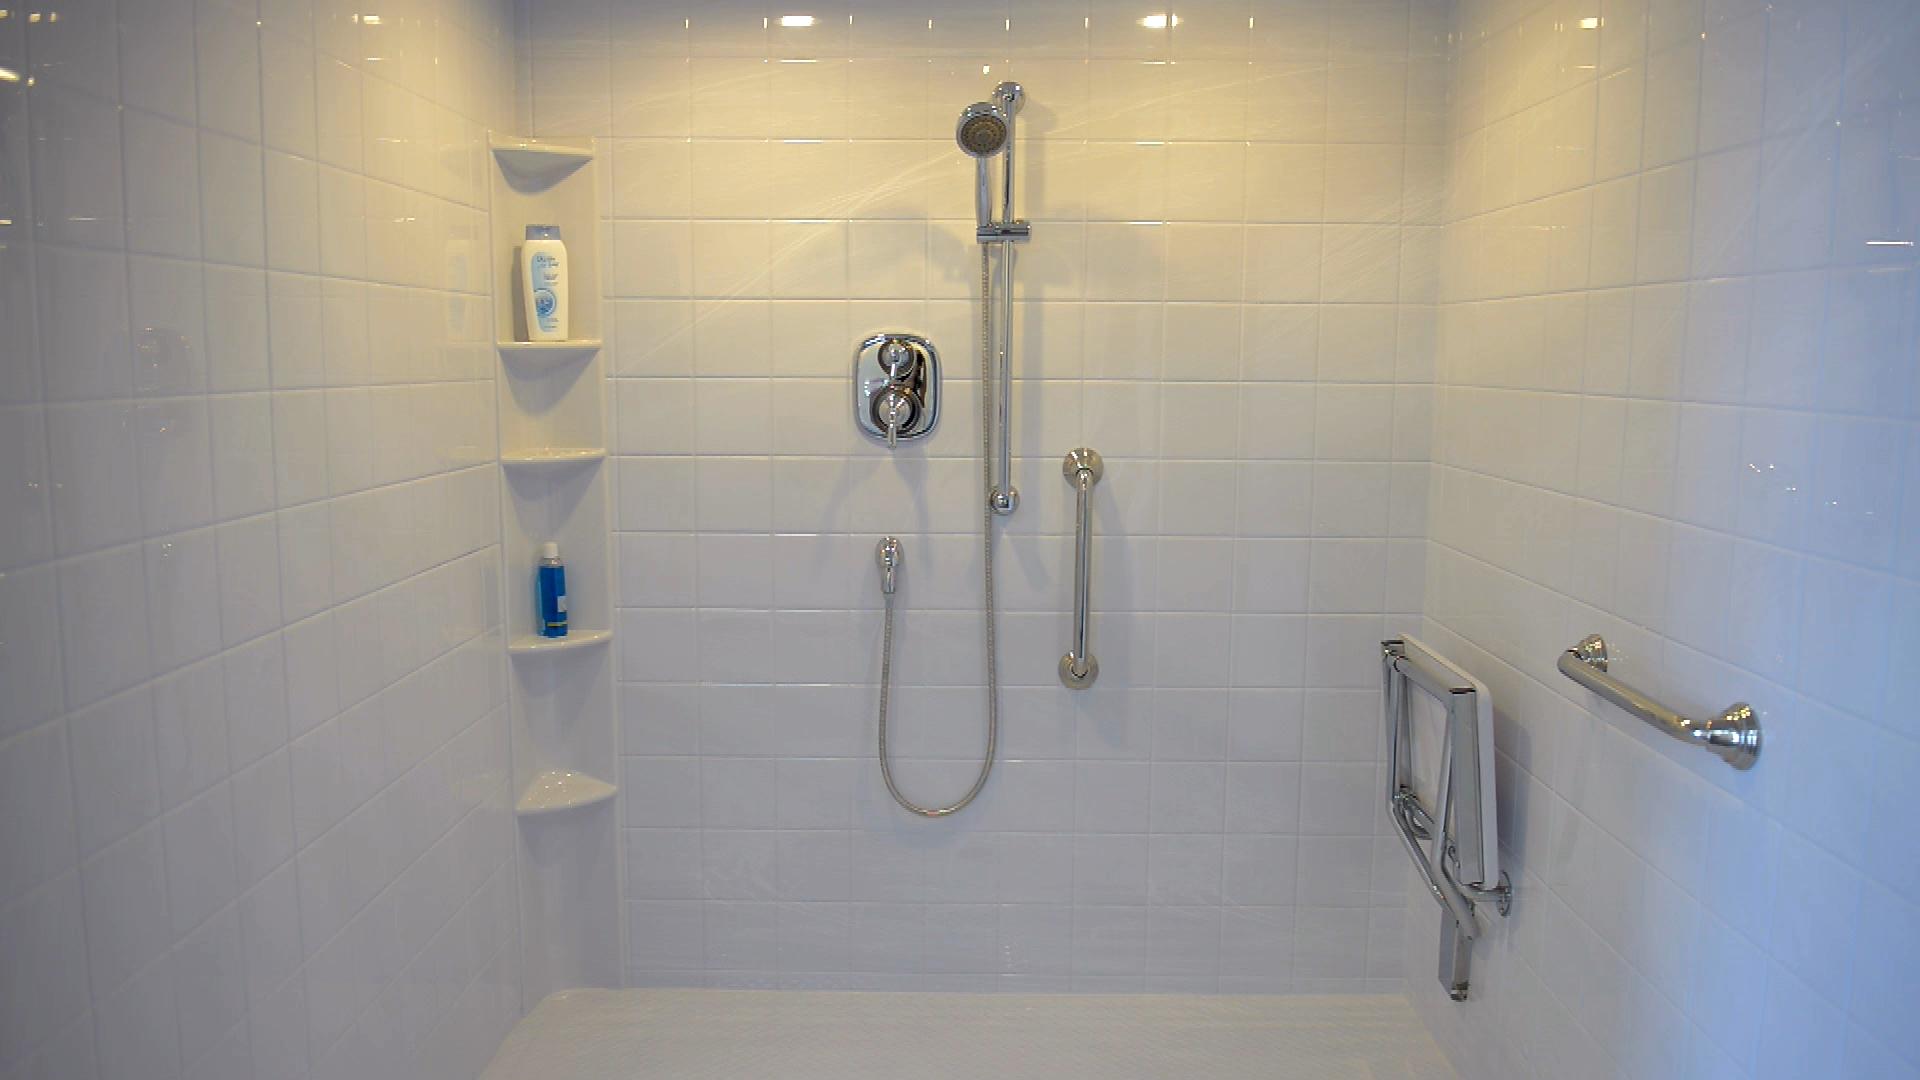 Habitat Meuble De Salle De Bain rénovation de salle de bain